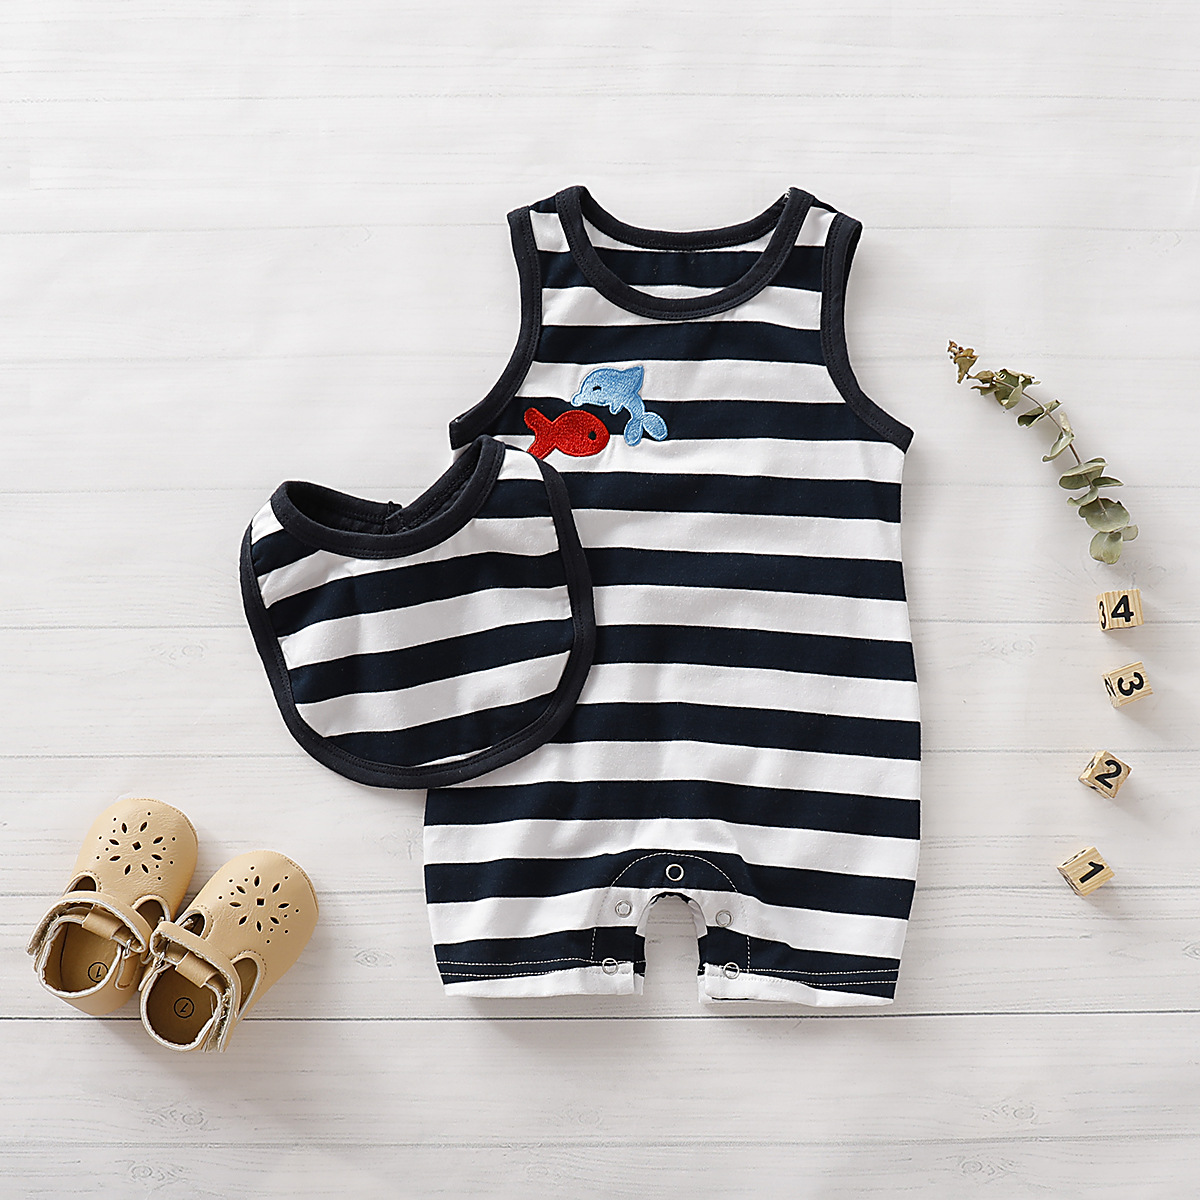 Newborn Infant Baby Boys   Rompers   Sleeveless Shark Jumpsuits+Bibs Cotton Toddler Kids 0-18M Children Playsuit One Piece Clothes